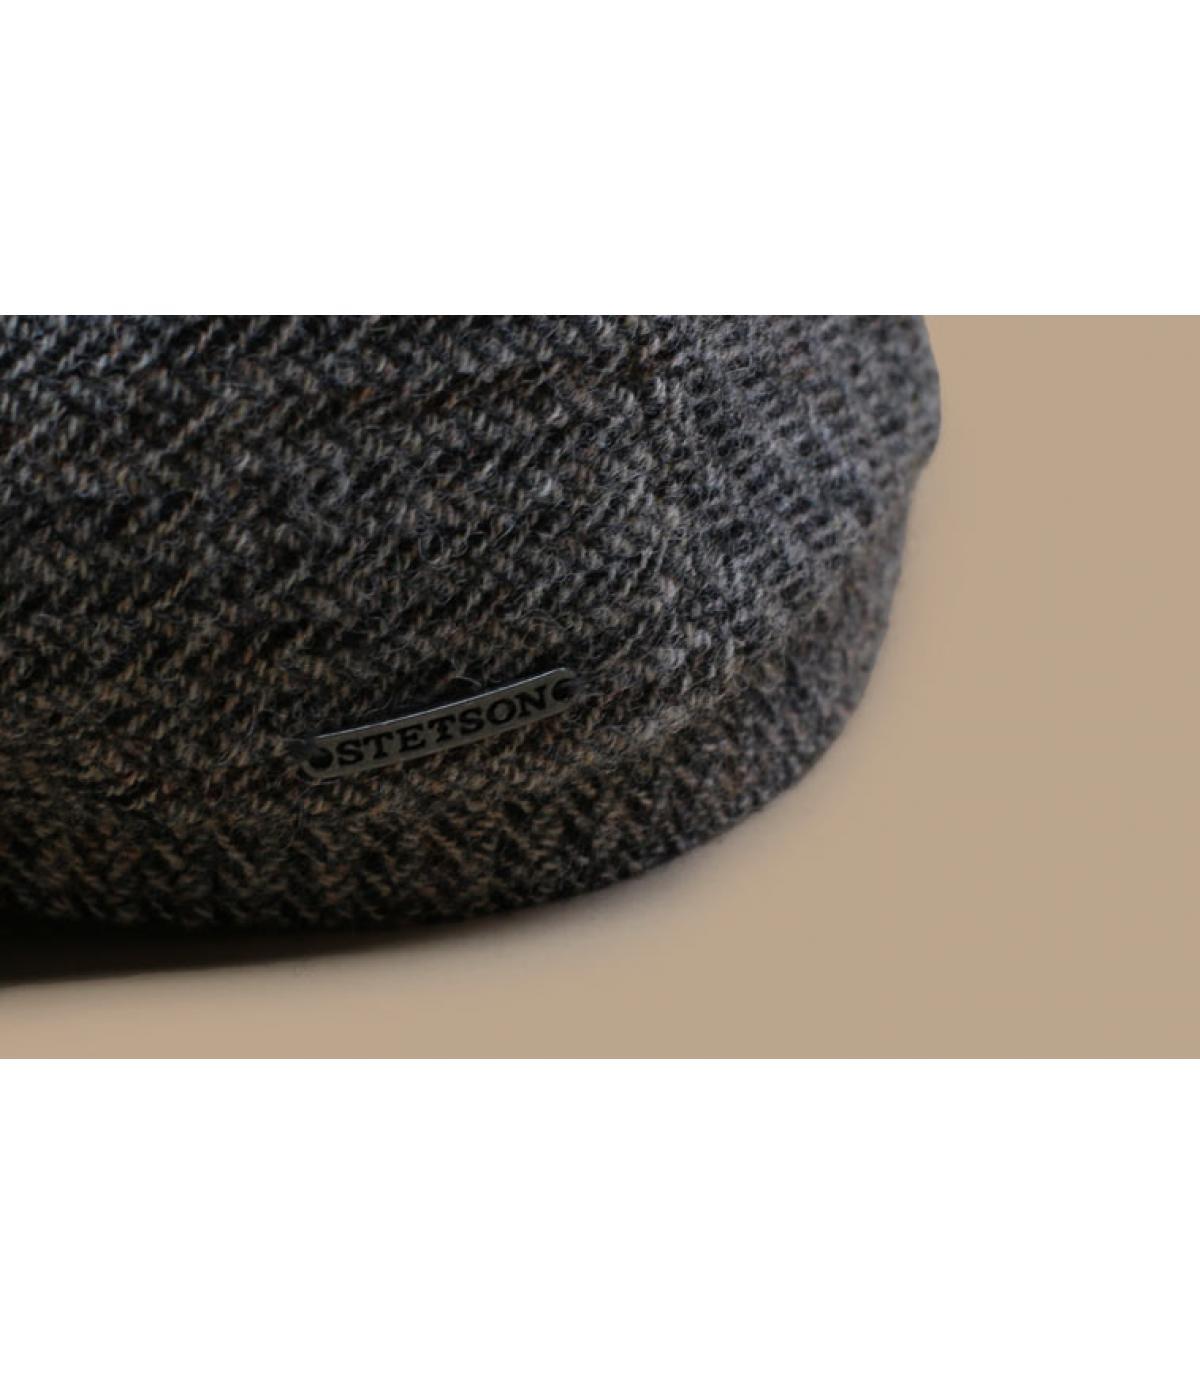 Dettagli Driver Cap Virgin Wool Herringbone grey - image 3